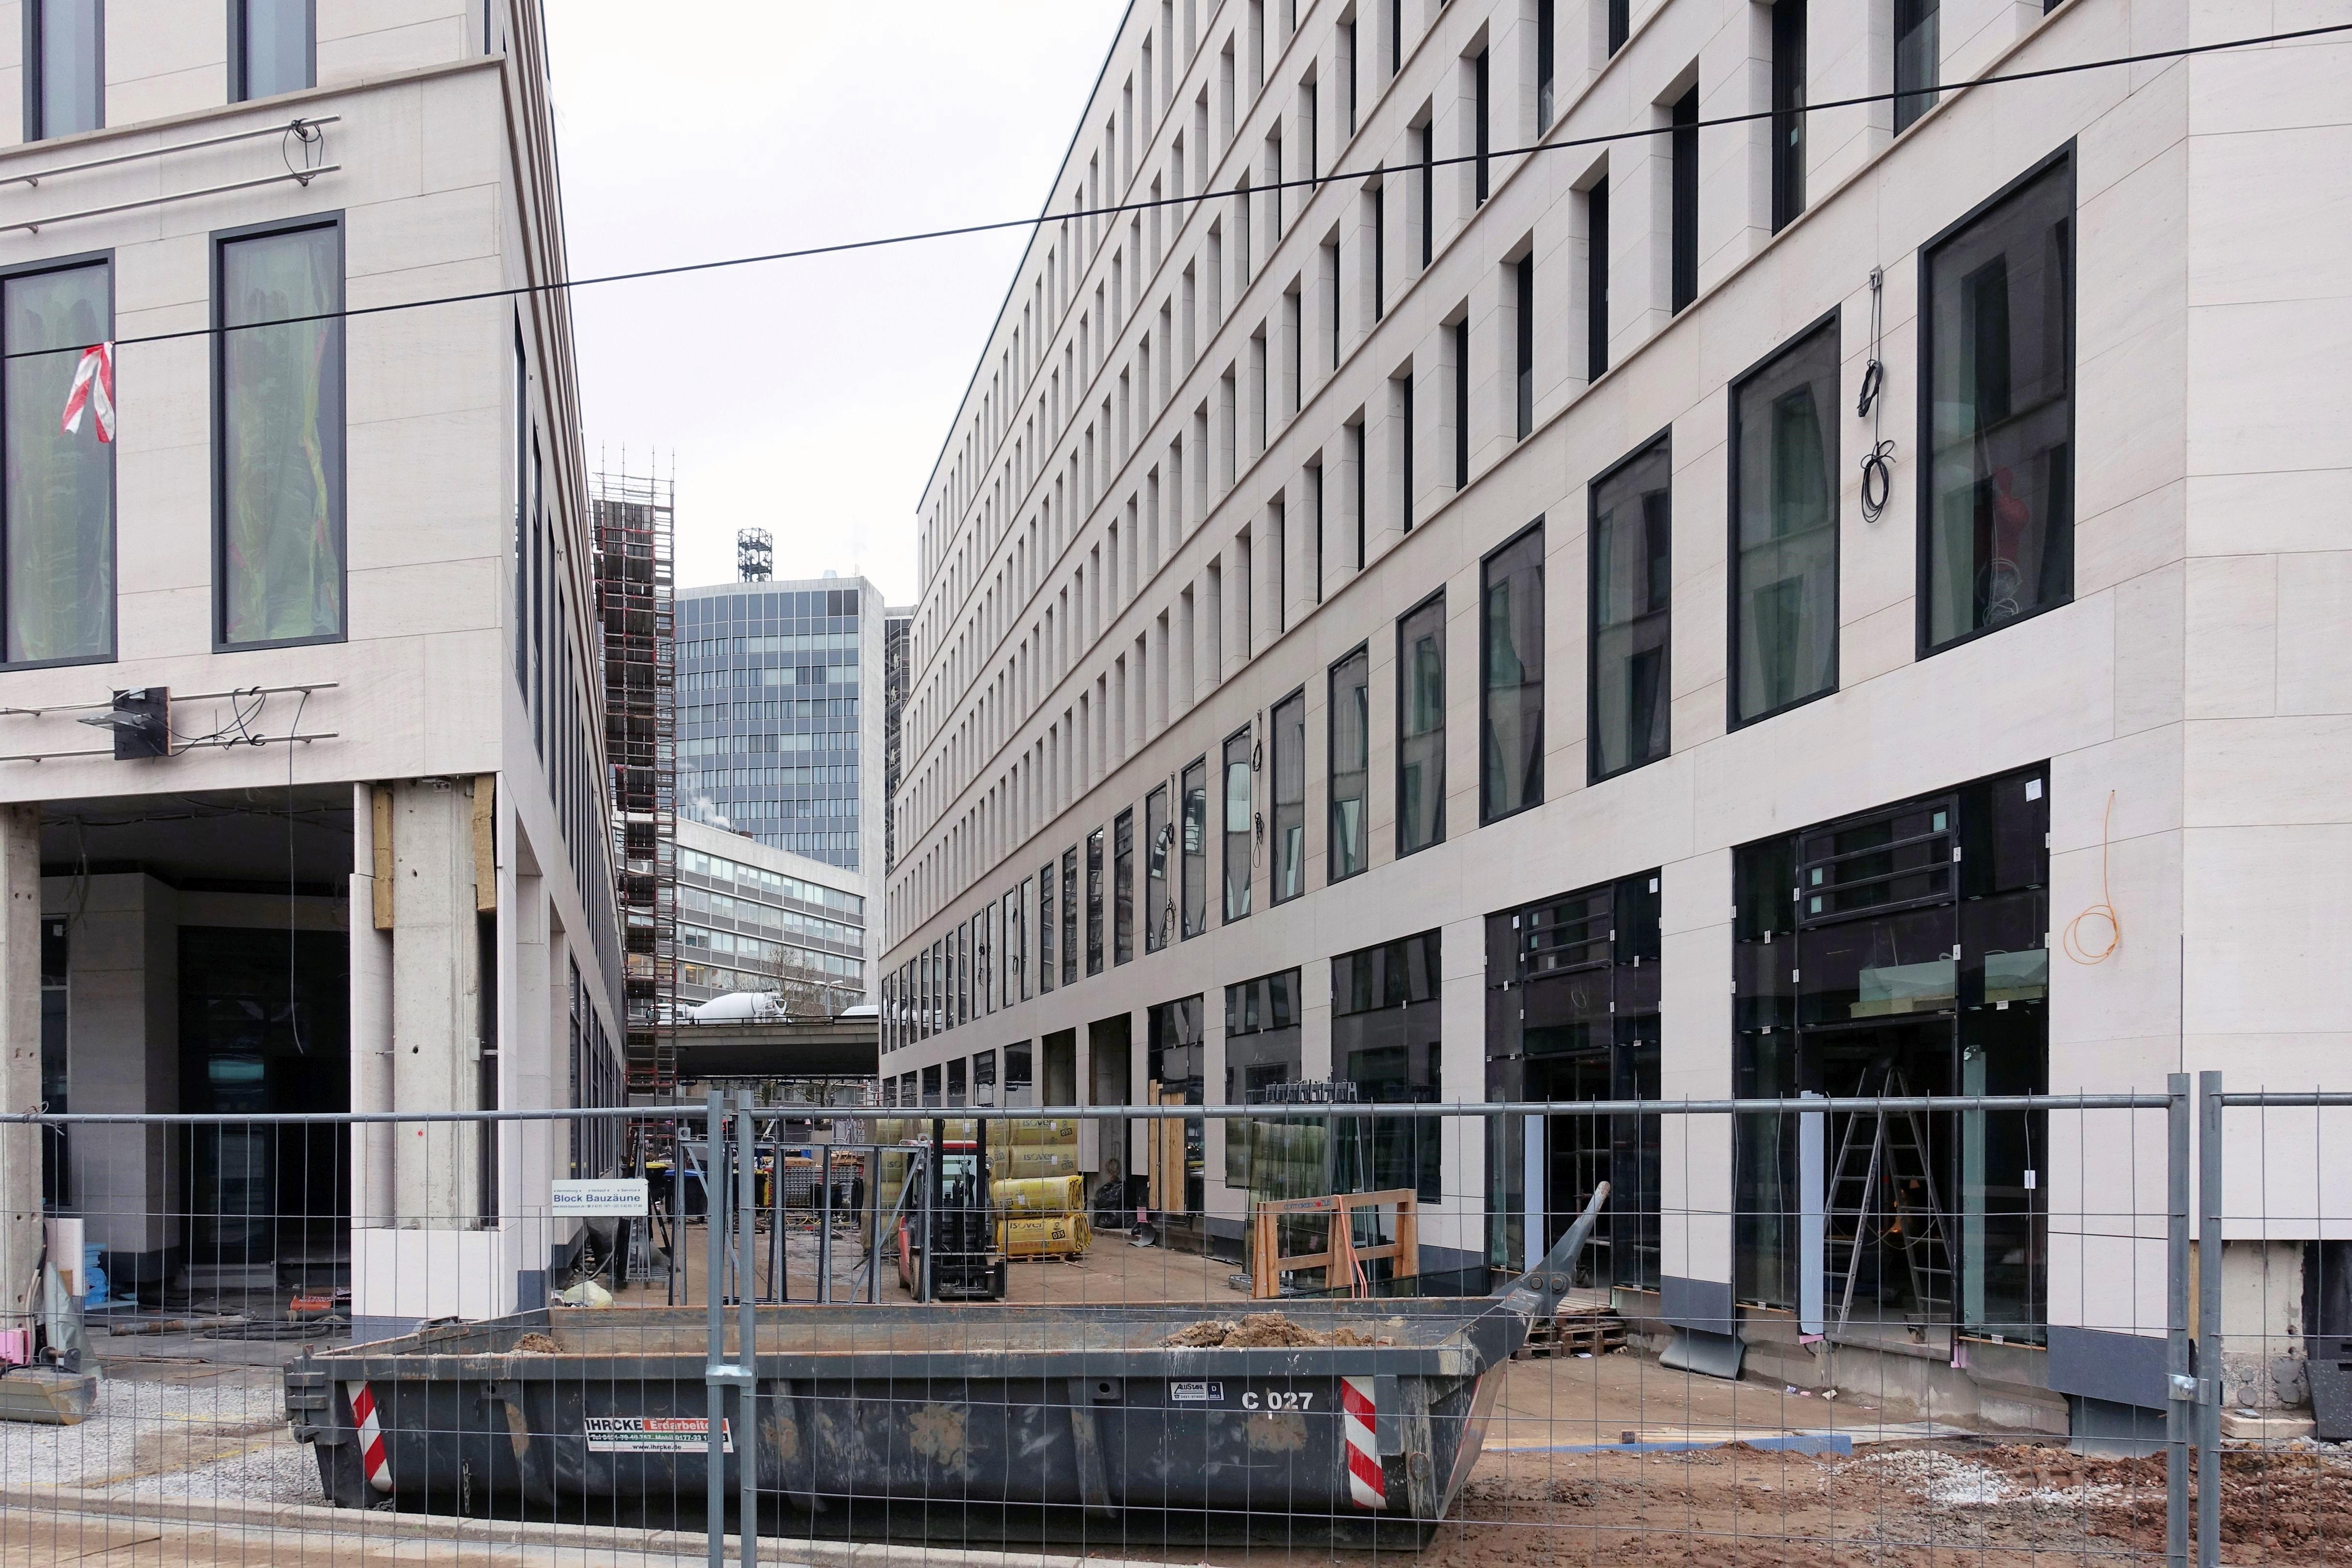 Baustelle Bahnhofsplatz 326